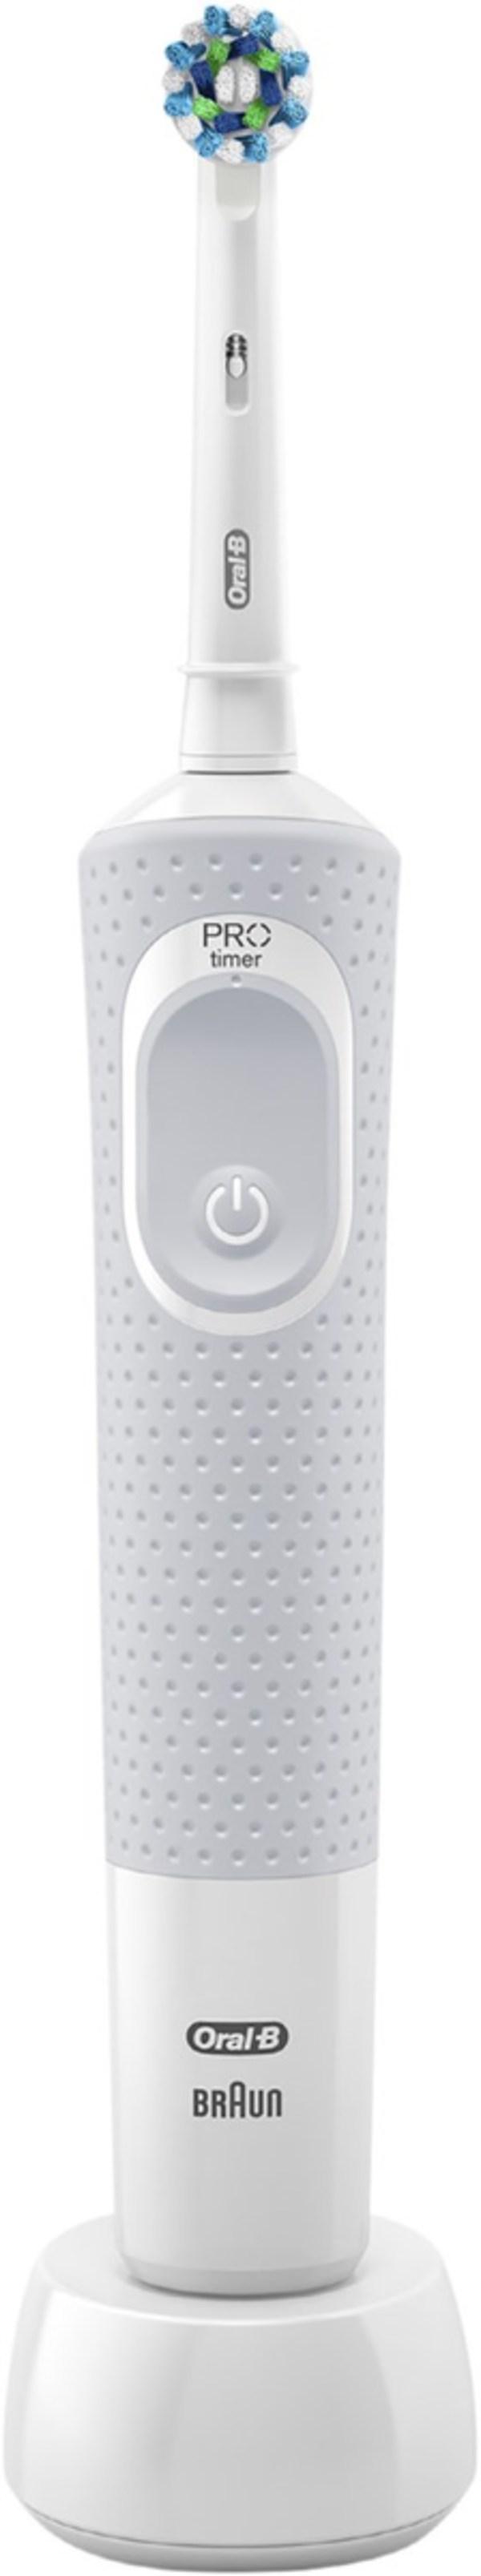 Oral-B Vitality 100 Hangable Box Elektrische Zahnbürste weiß